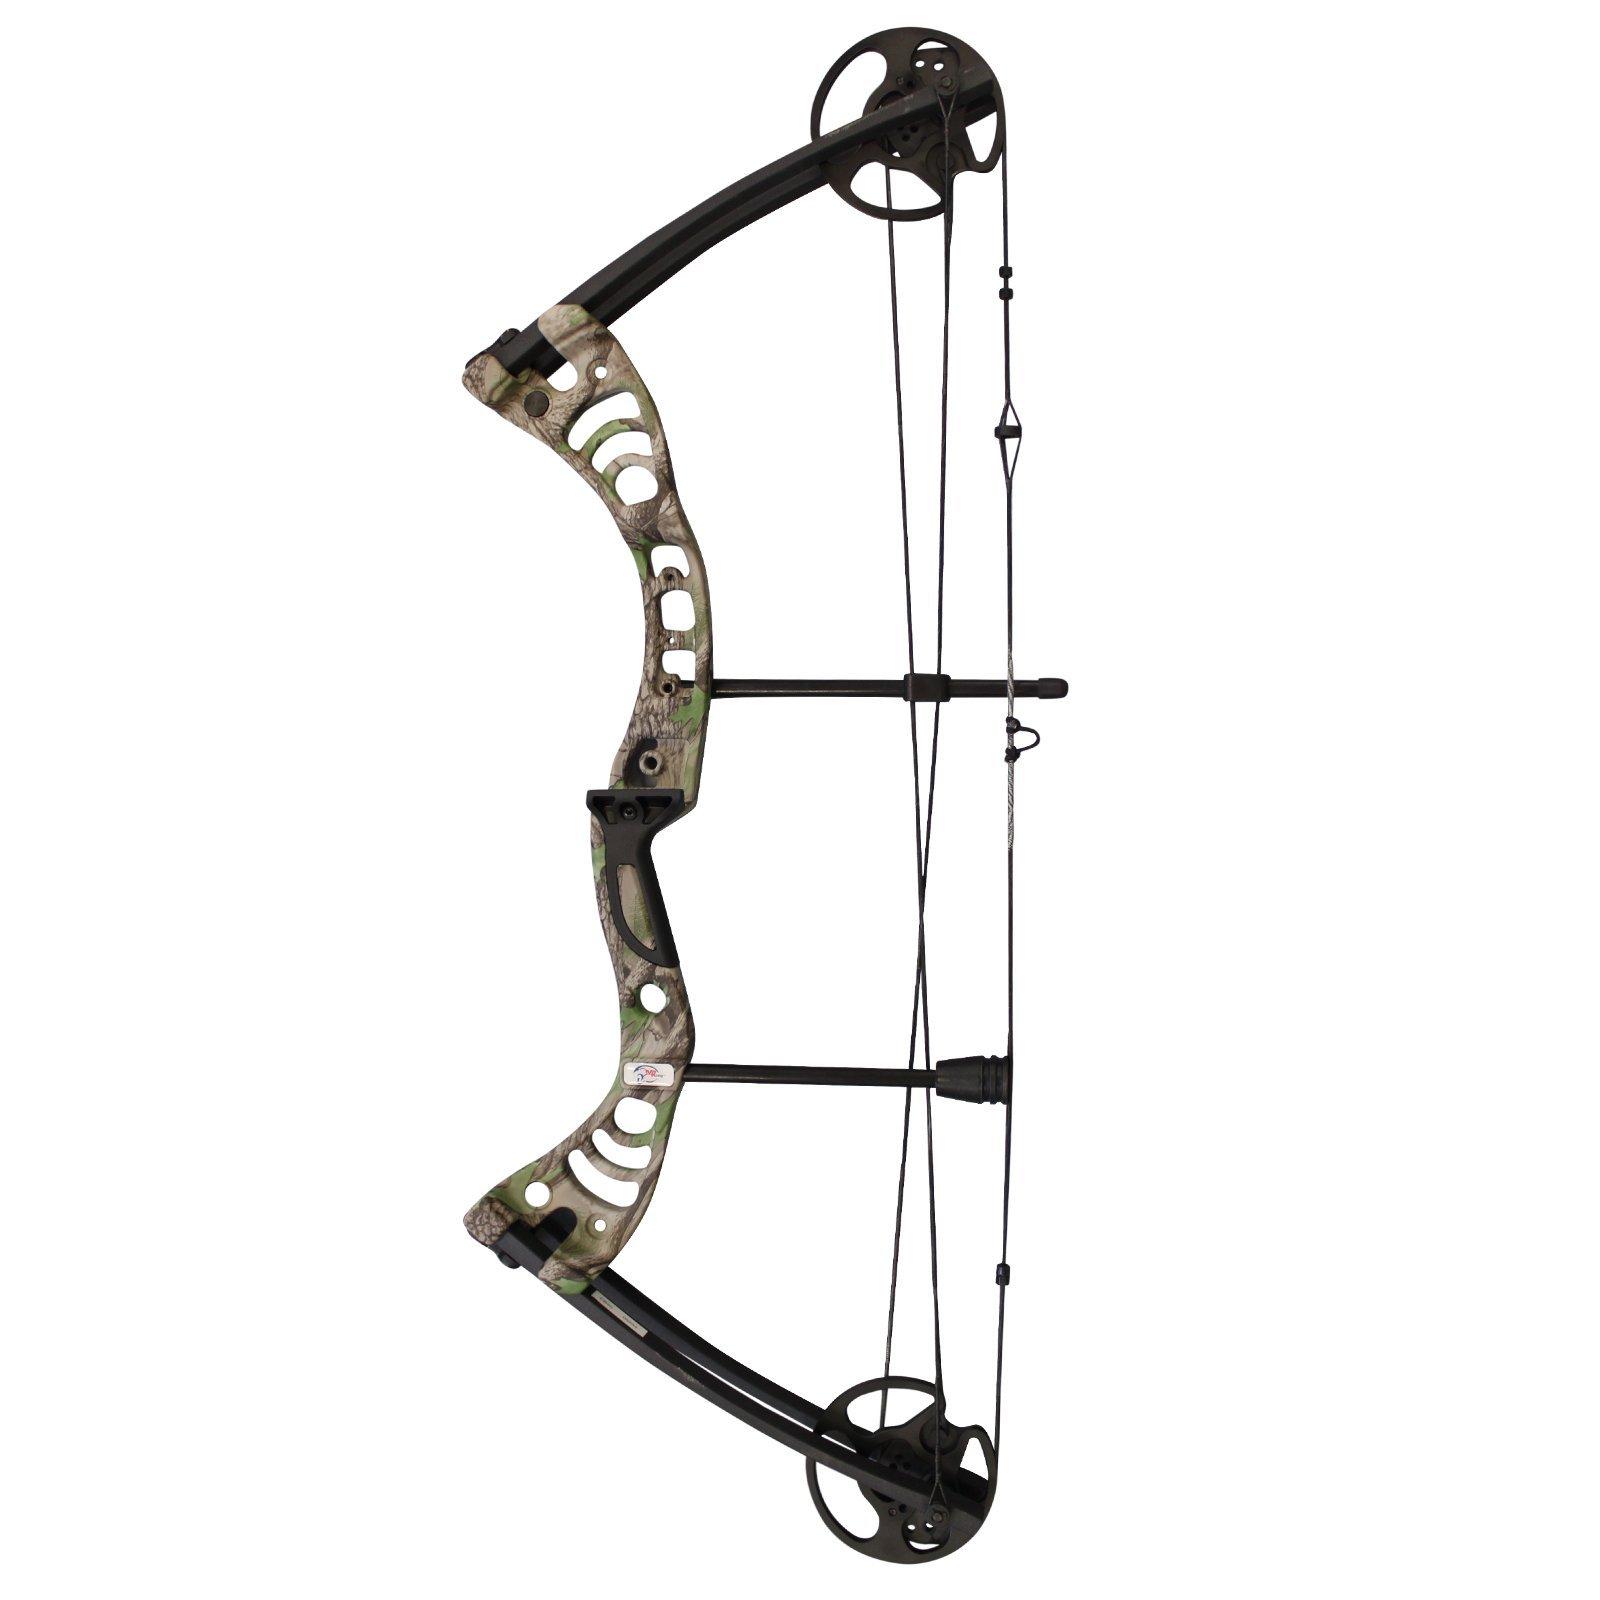 Southland Archery Supply SAS Scorpii 55 Lb 32'' Compound Bow (GC Camo)